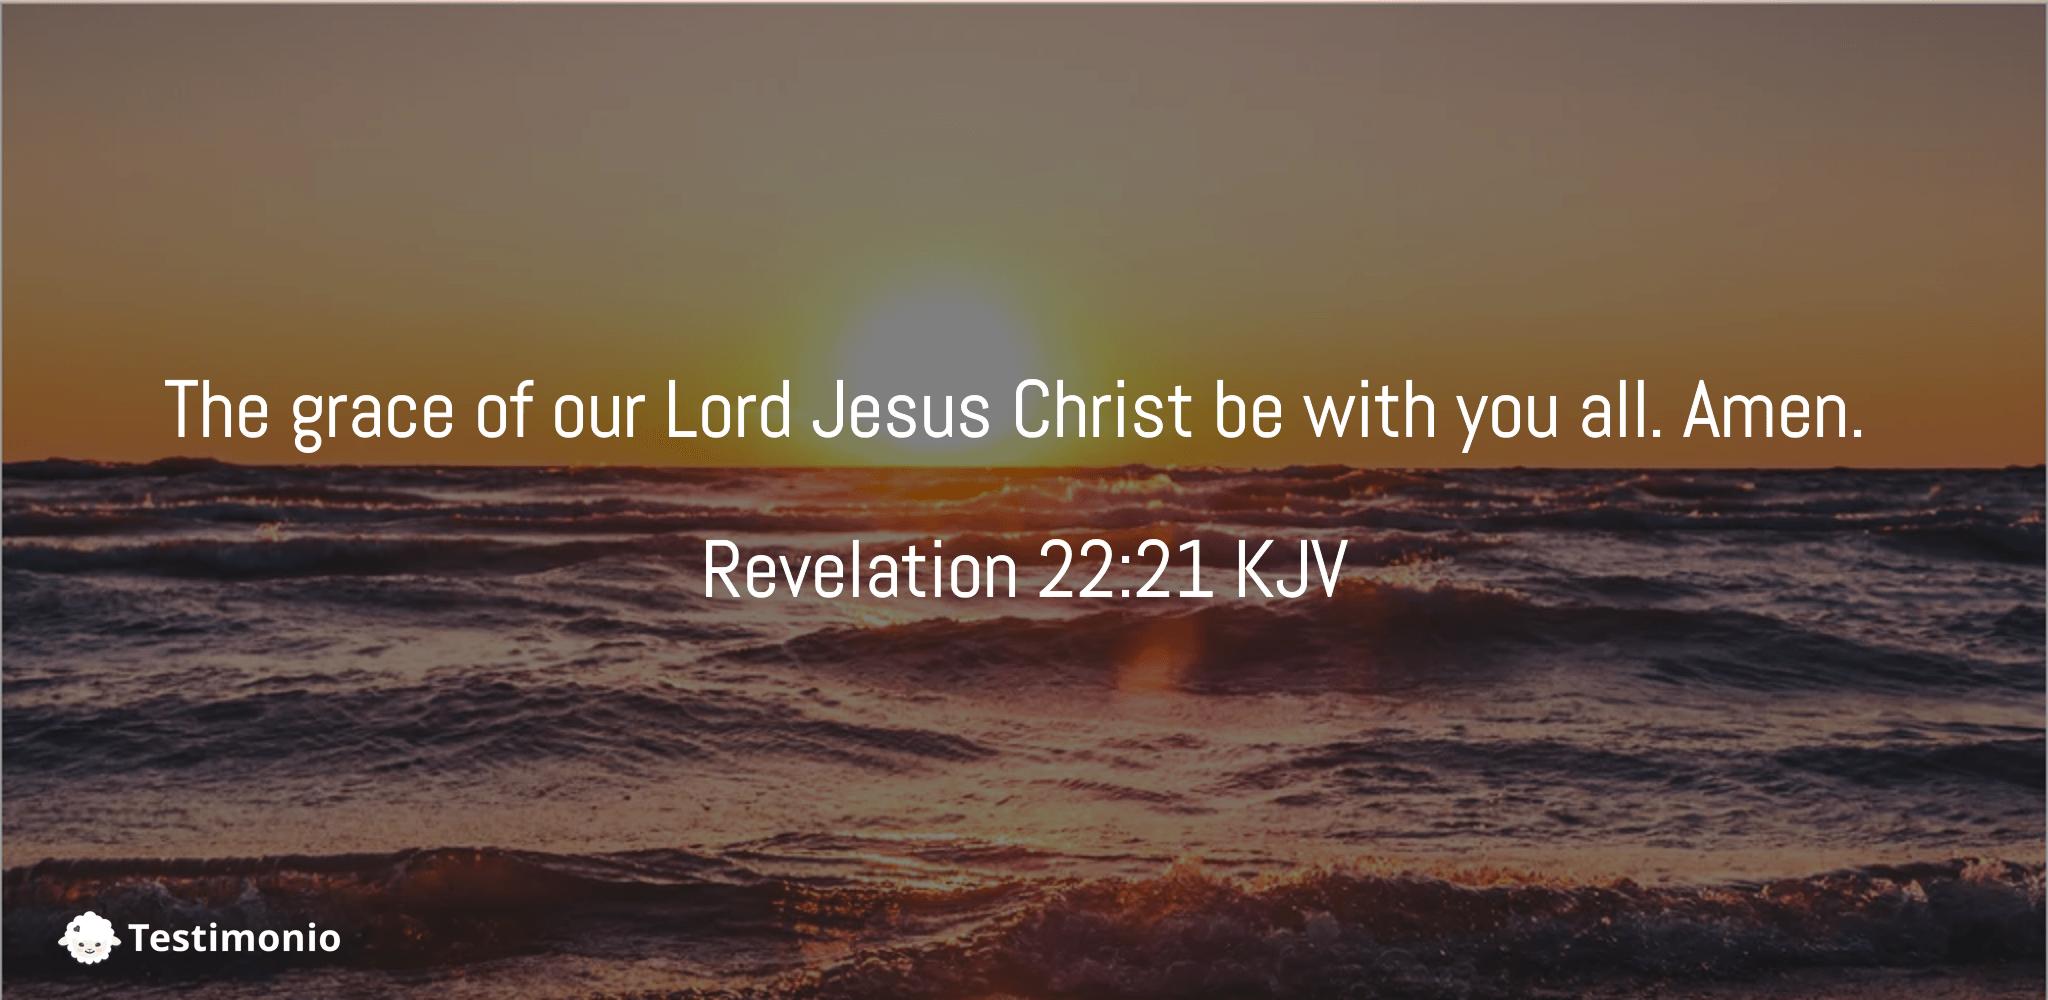 Revelation 22:21